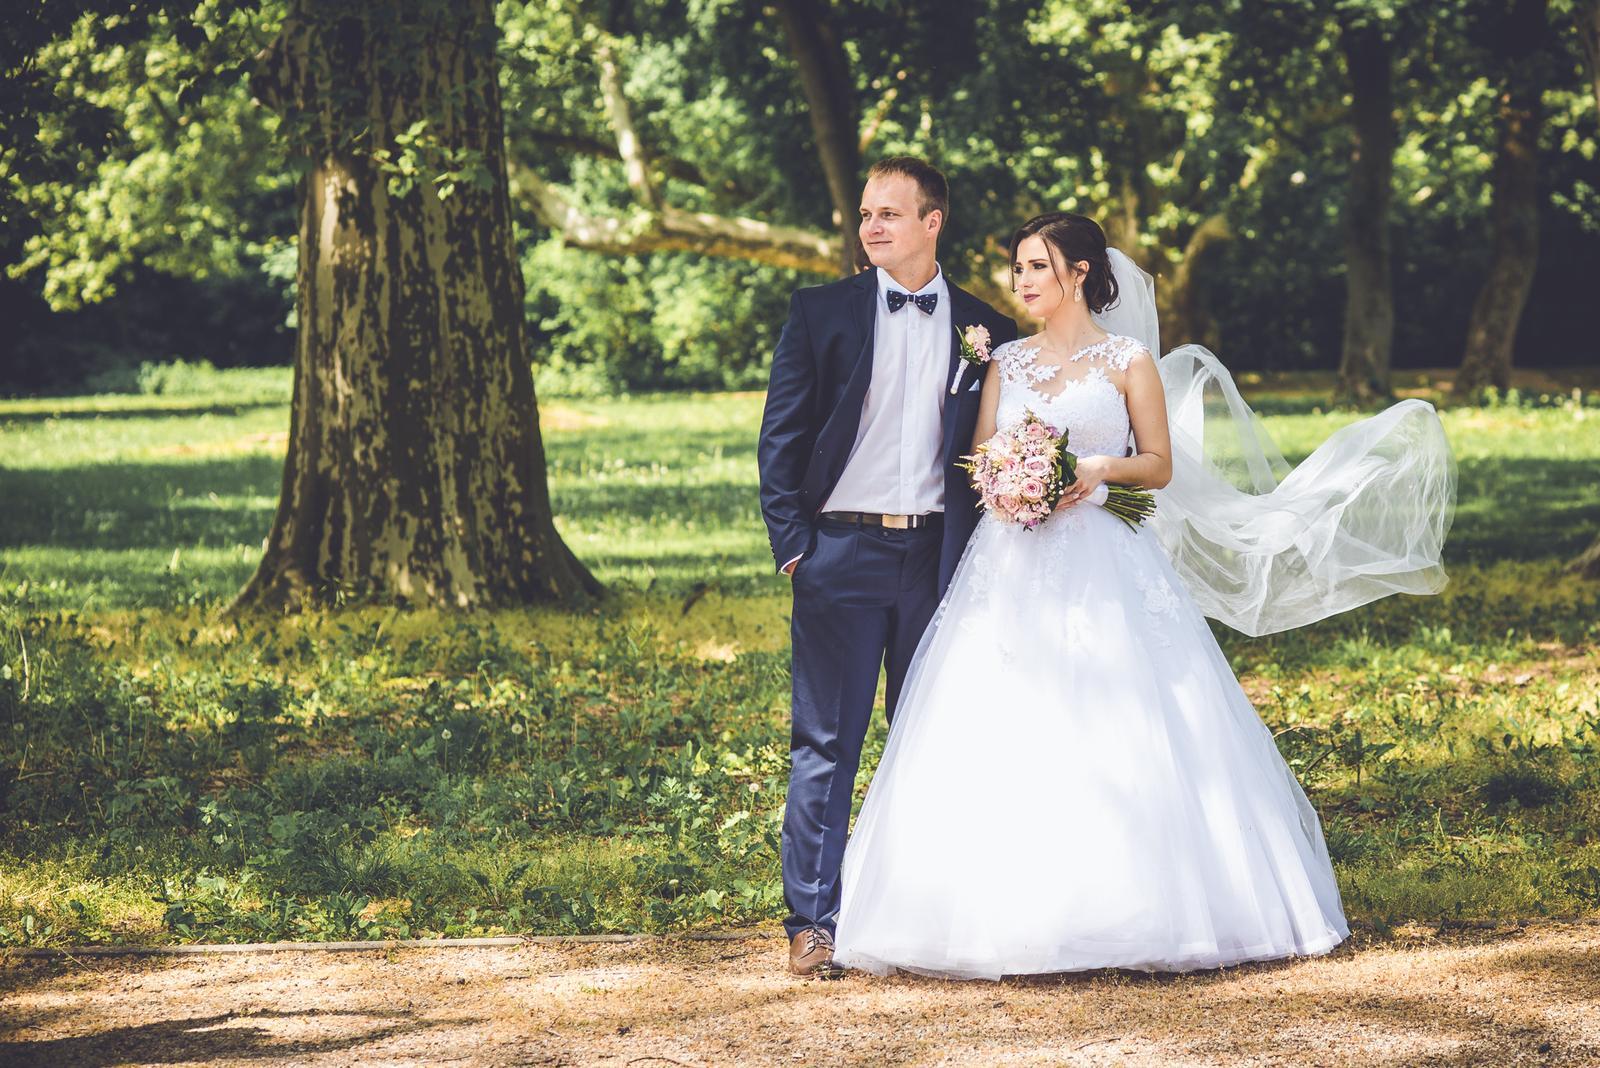 511e75f6a8 Fotograf a kameraman na svadbu 14.9.2019 v Trnave ...